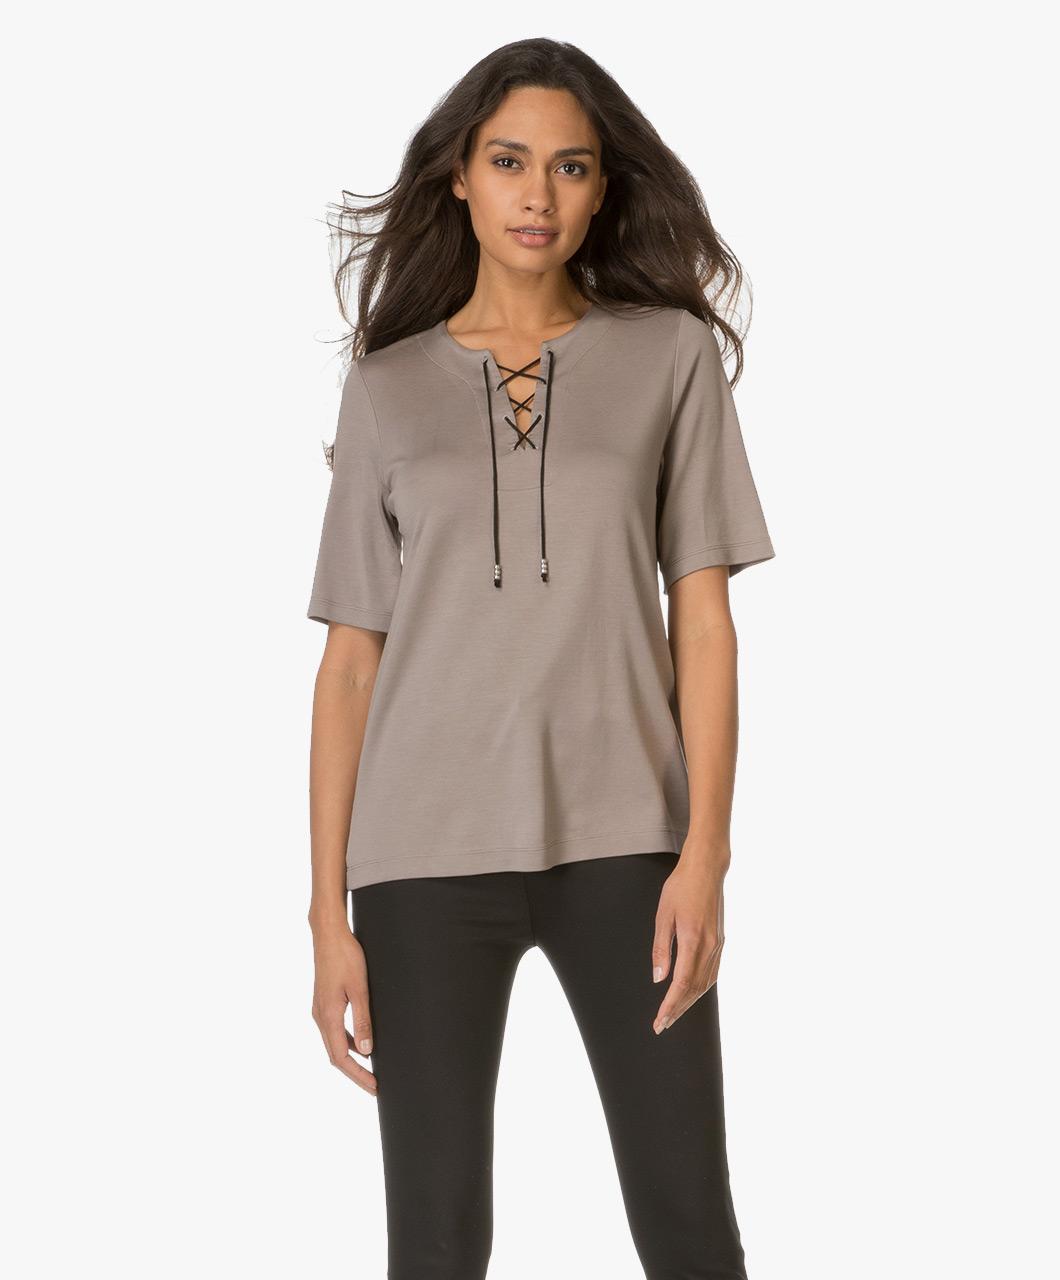 drykorn sahar t shirt with lacing taupe sahar 506254 14. Black Bedroom Furniture Sets. Home Design Ideas